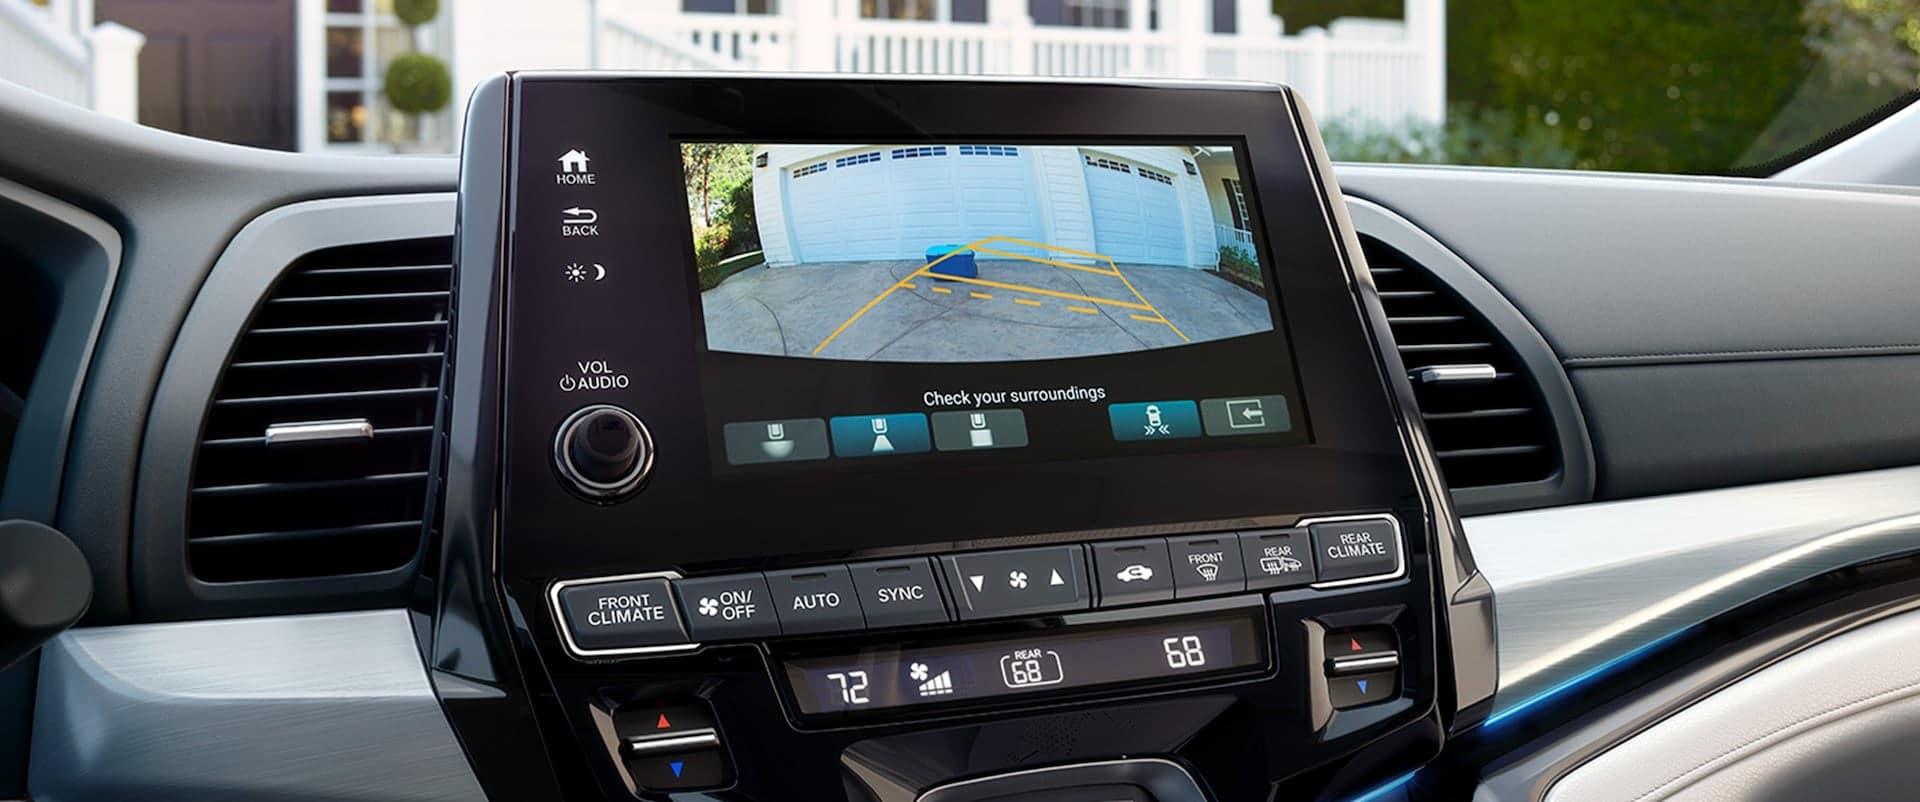 Honda_Odyssey_Interior_Infotainment_Screen